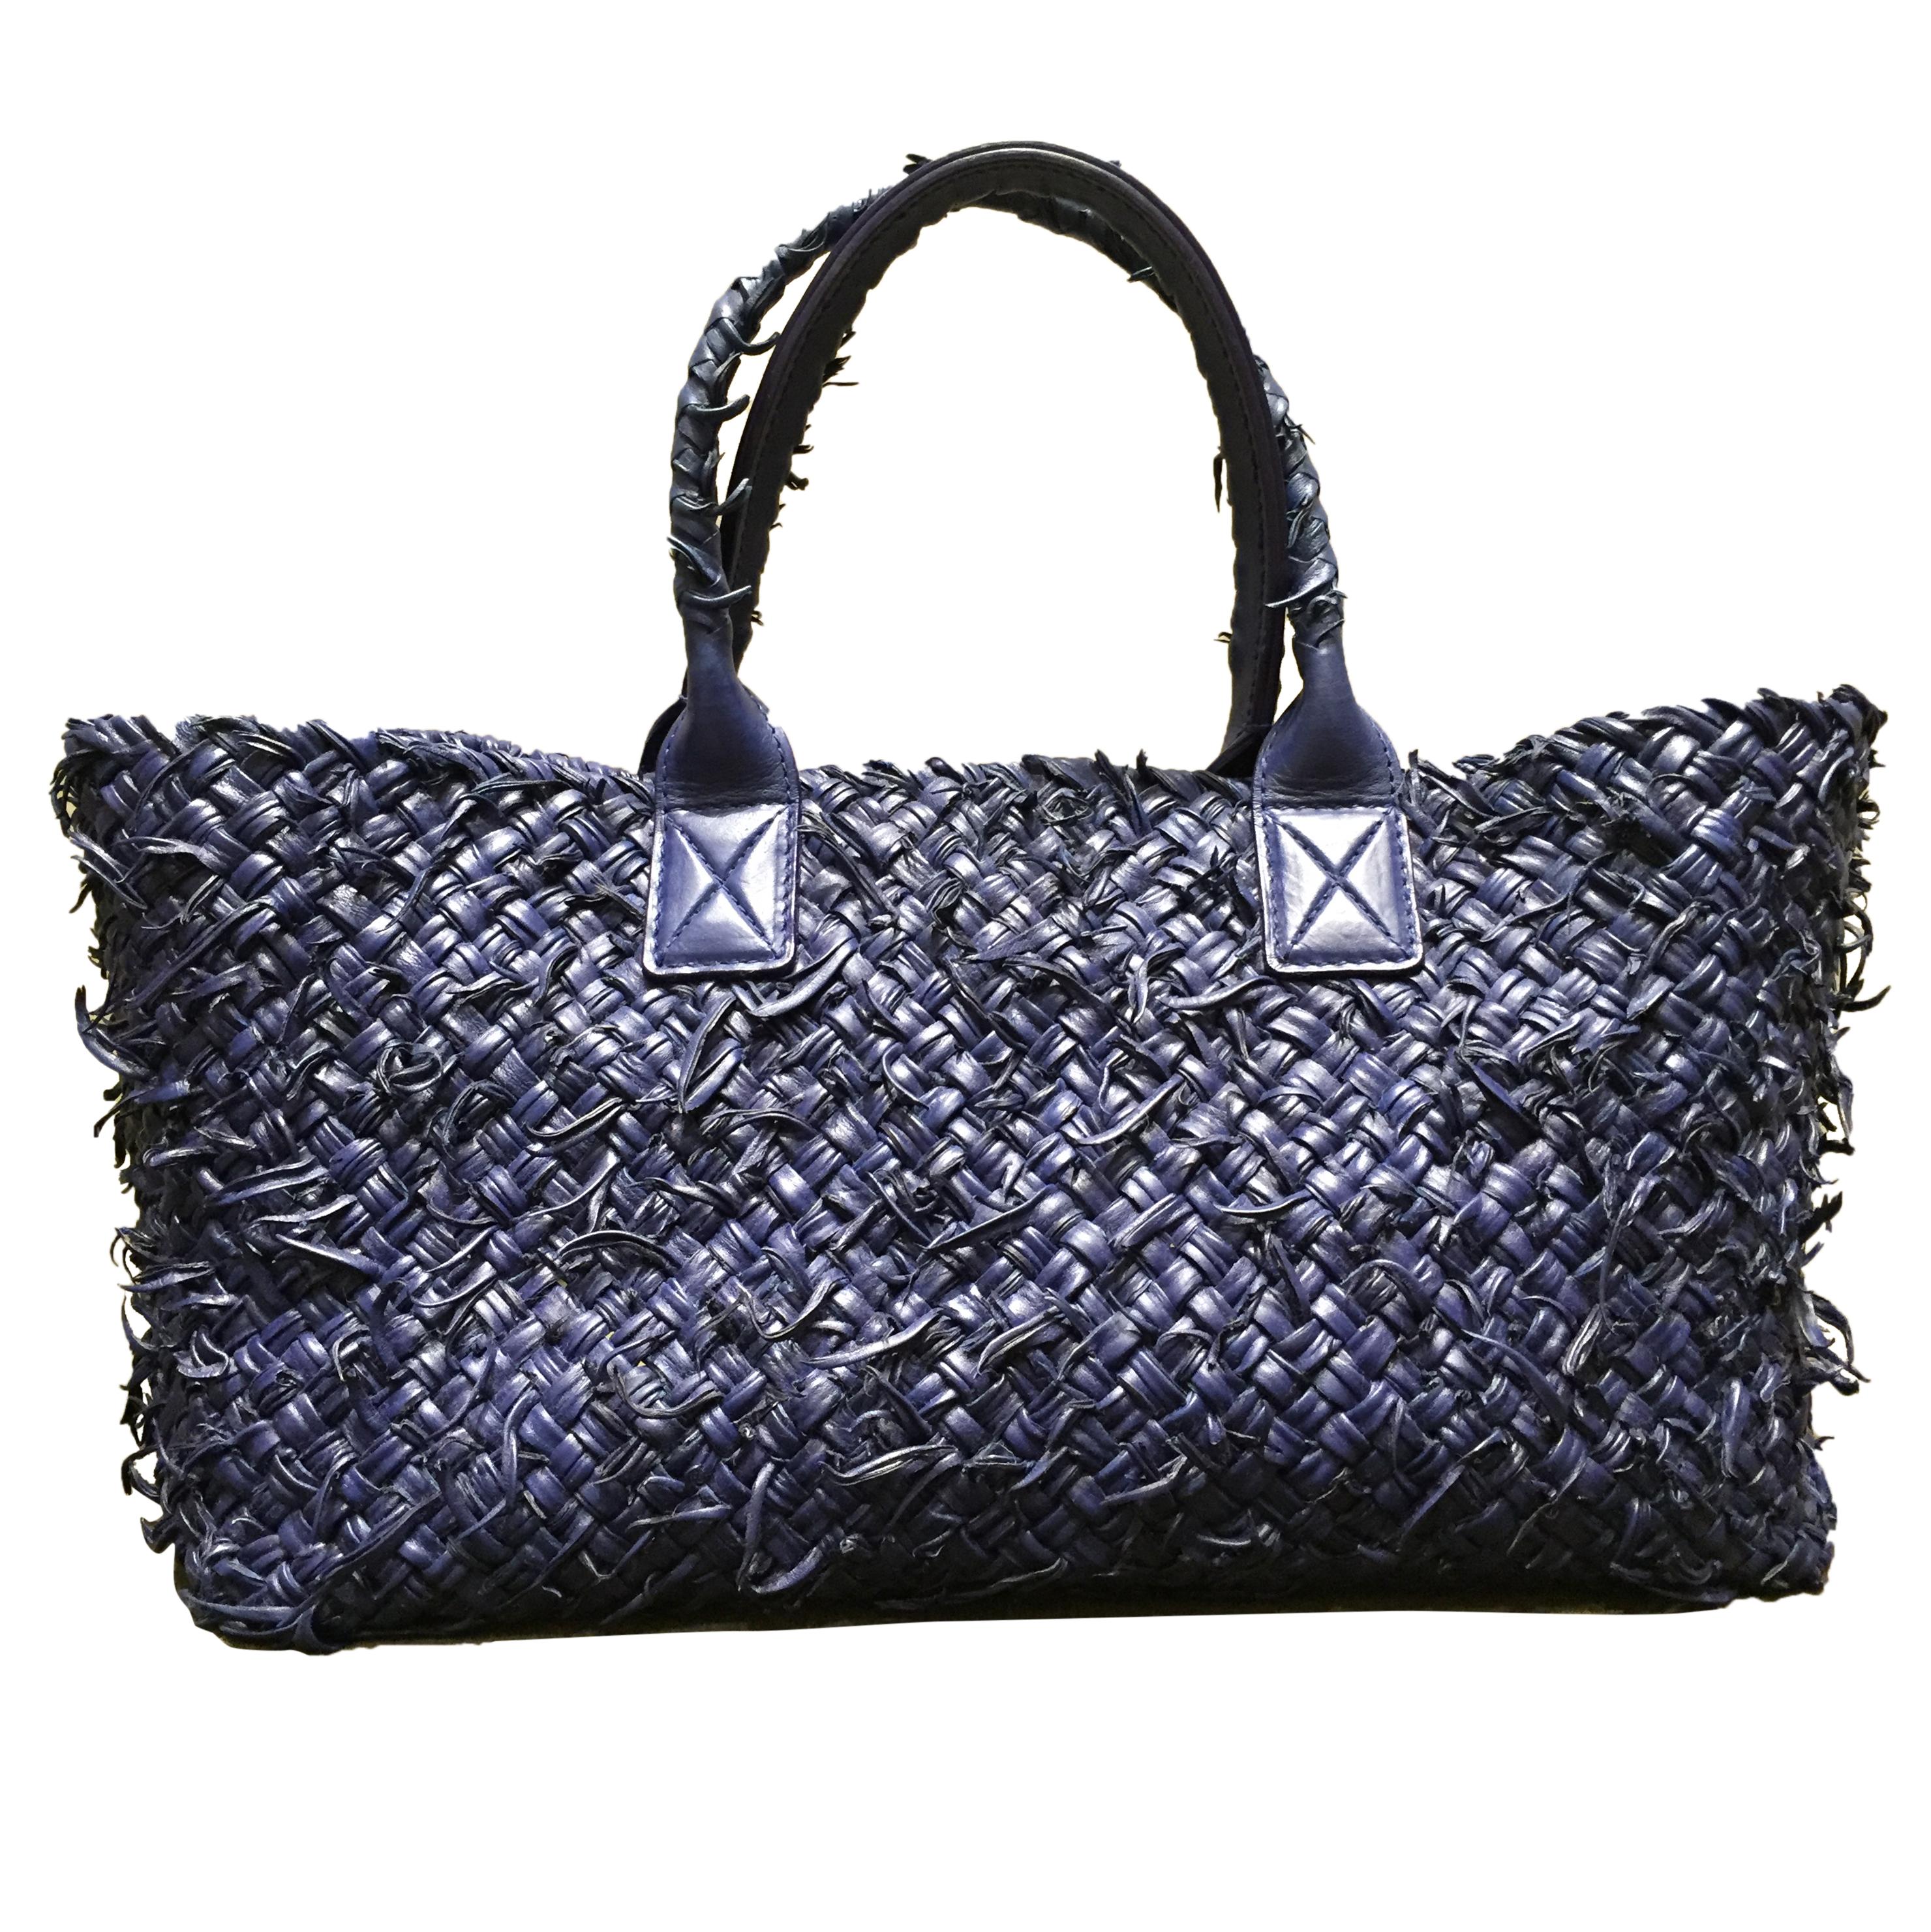 6be7f39e5c68 Bottega Veneta Sapphire Cabat Fuzzy Bag